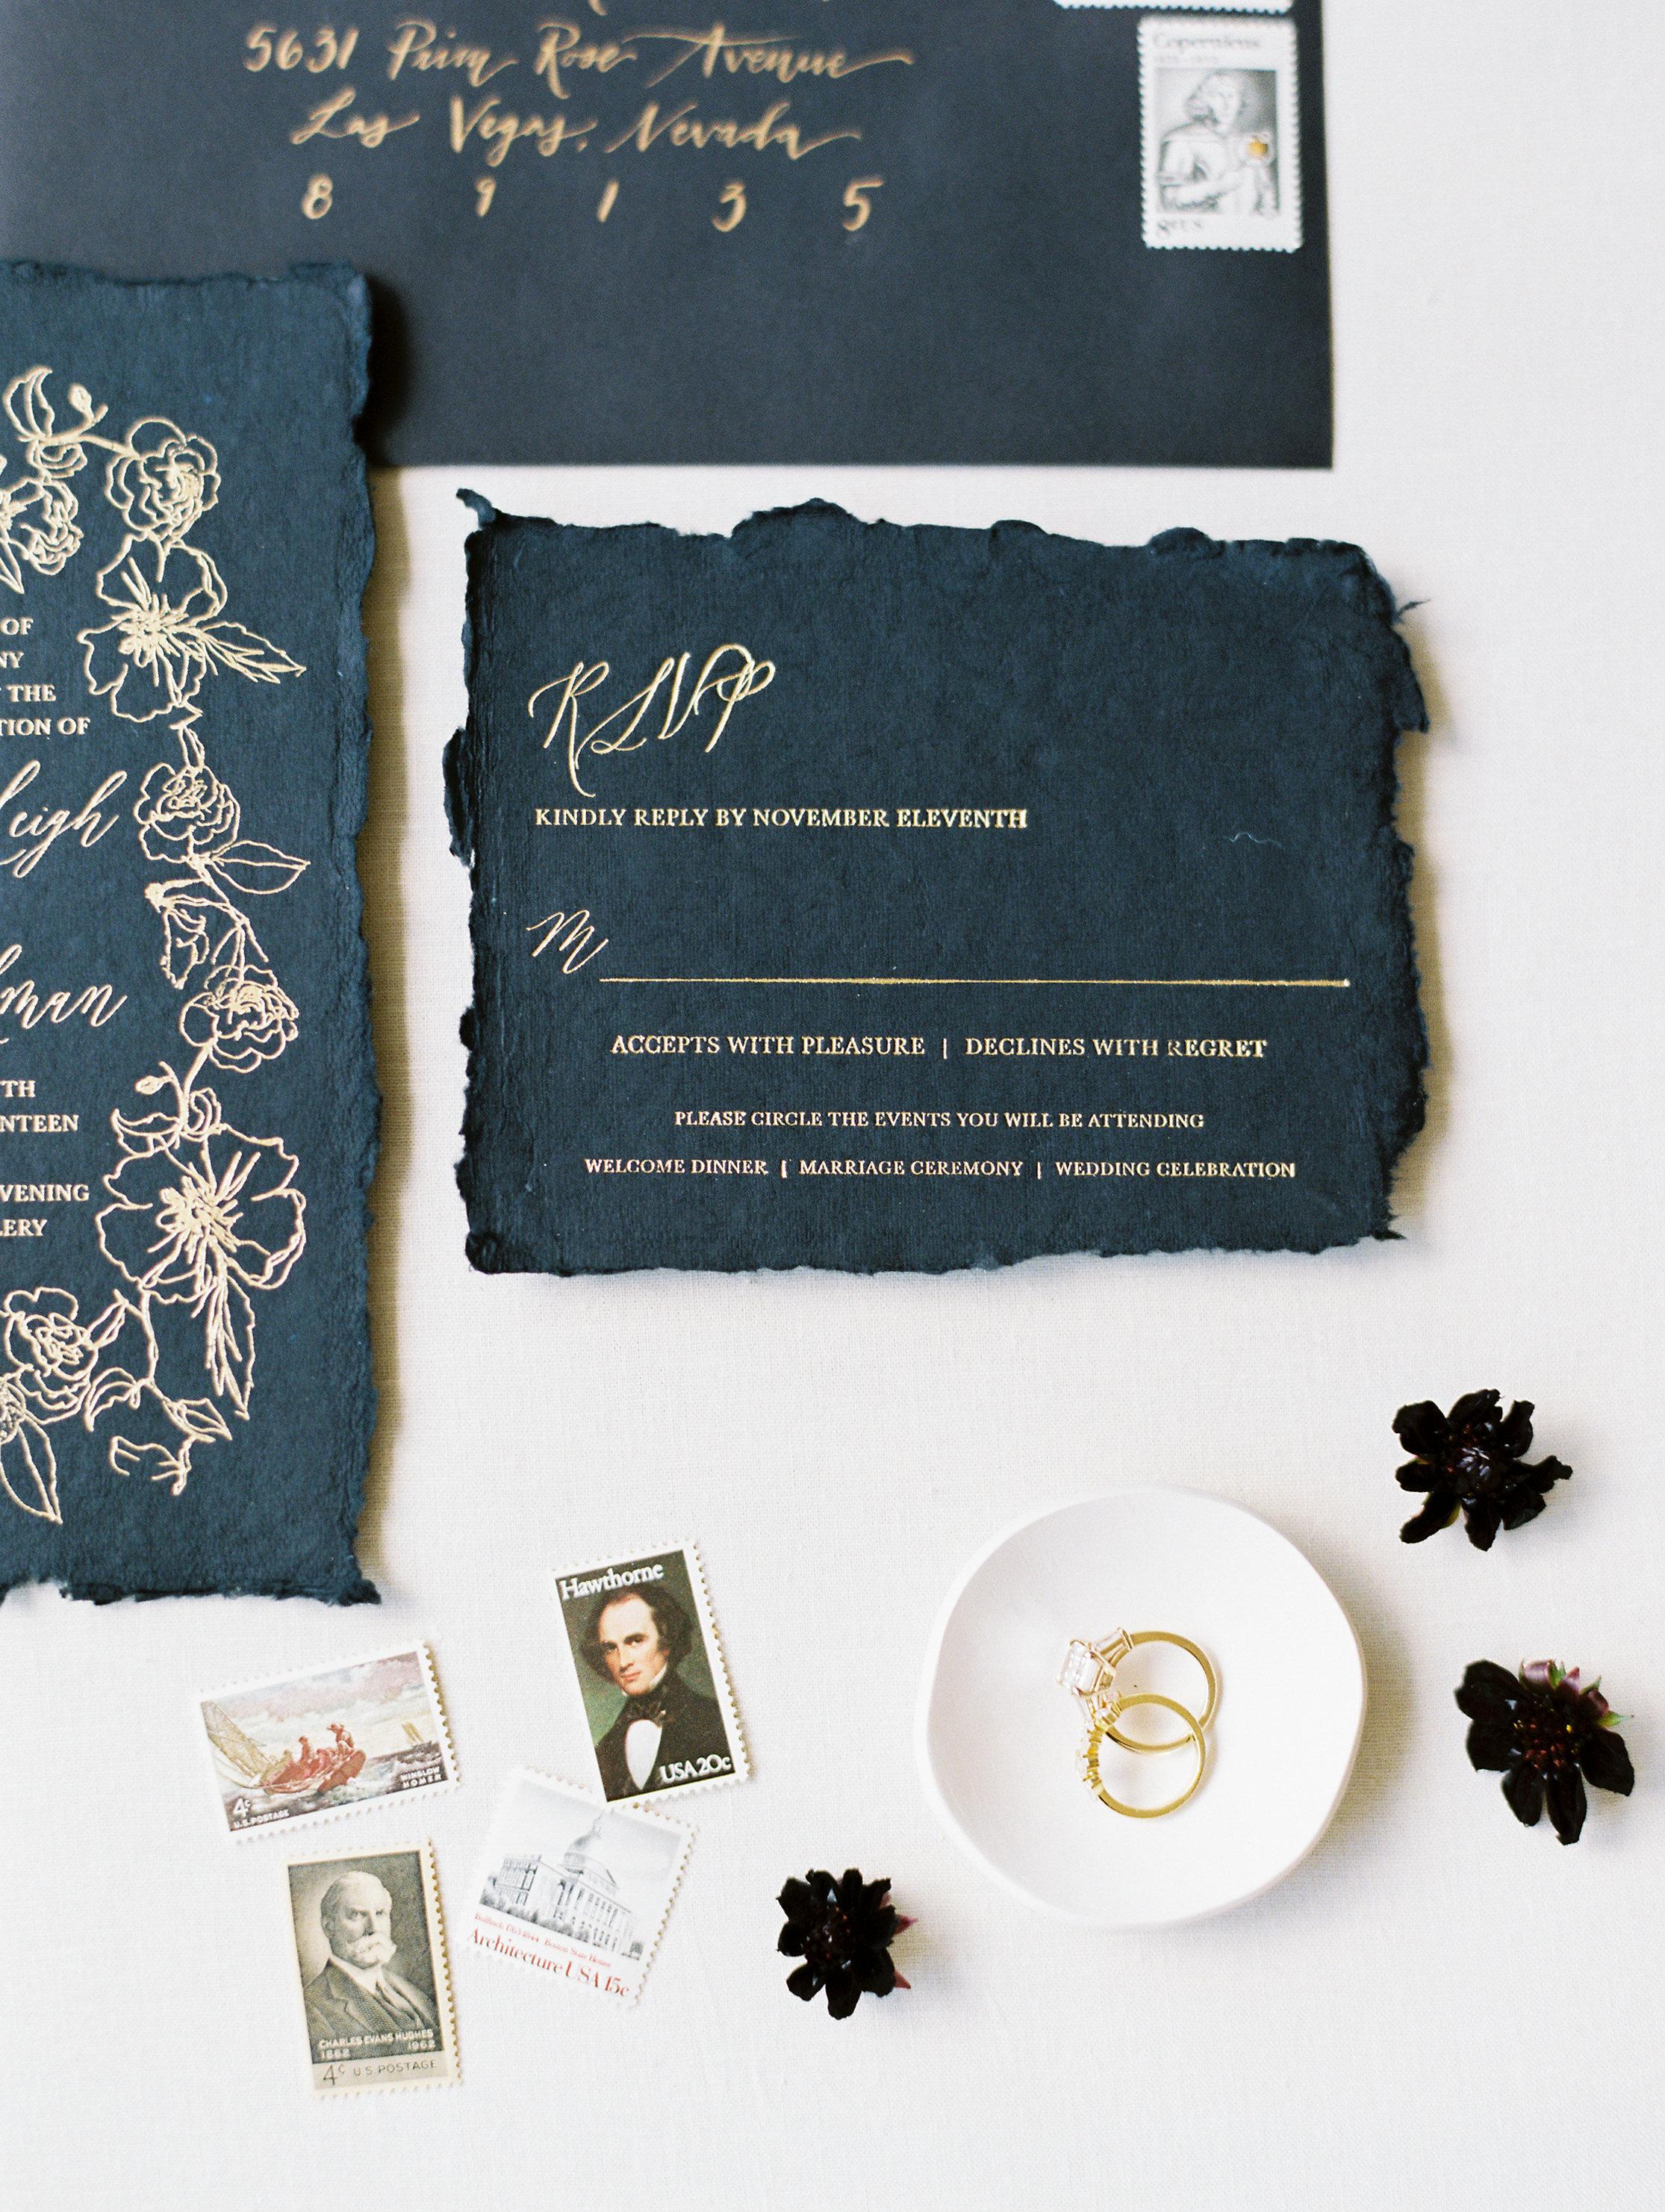 ink&pressco-mikylamanu-wedding-calligraphy-5-unearthing.tc.jpg